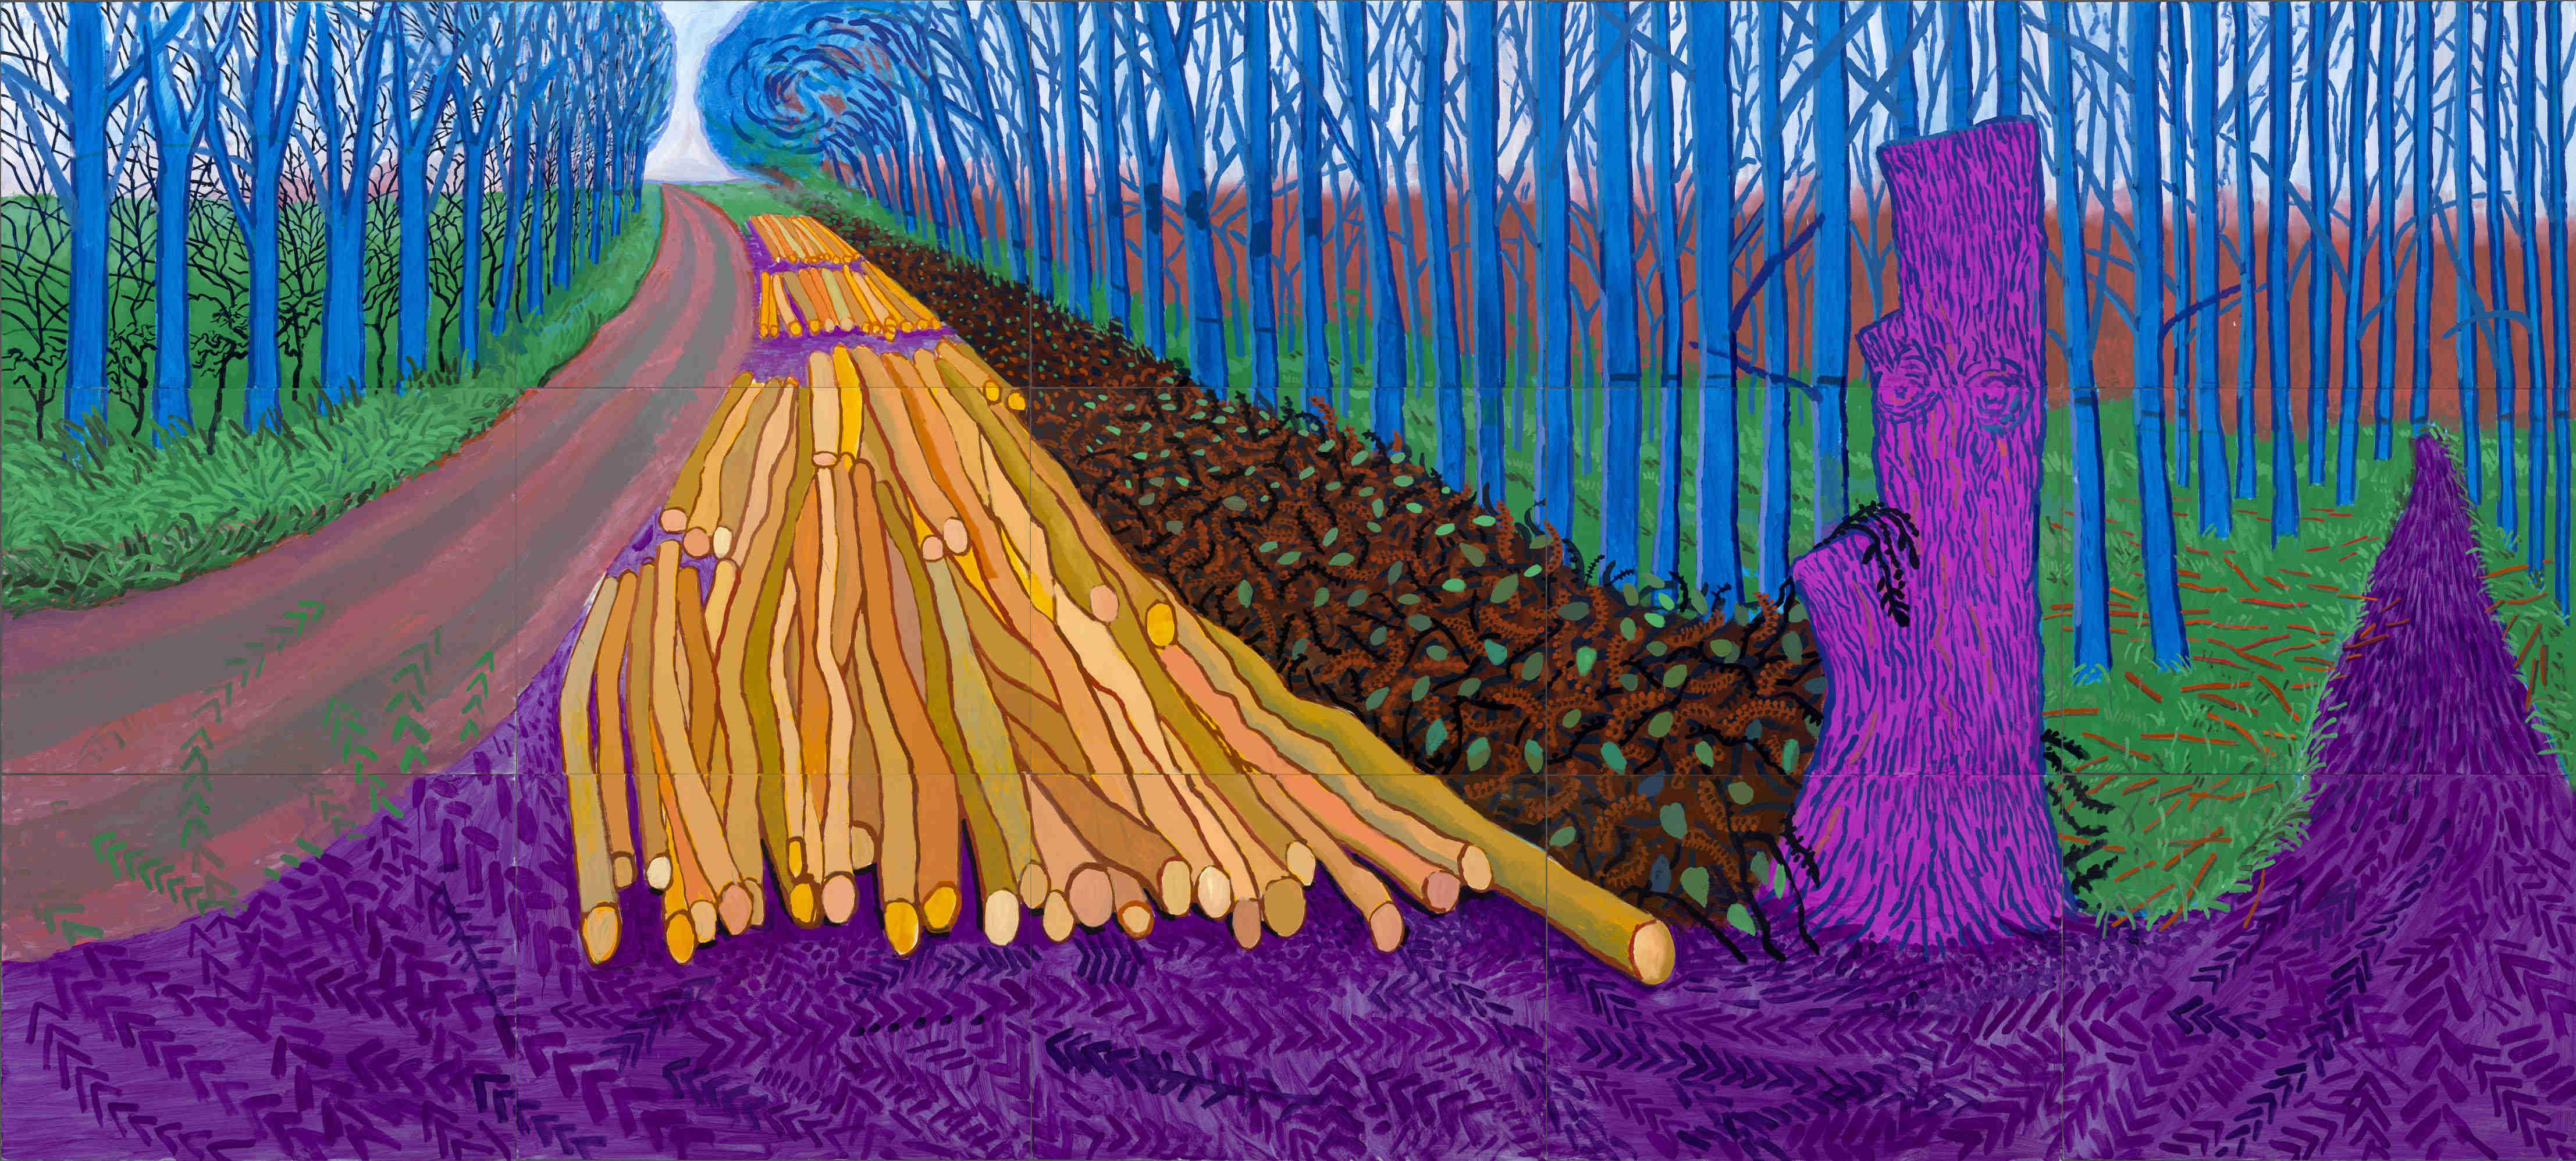 художник Дэвид ХОКНИ (1937) / «Зимний лес»